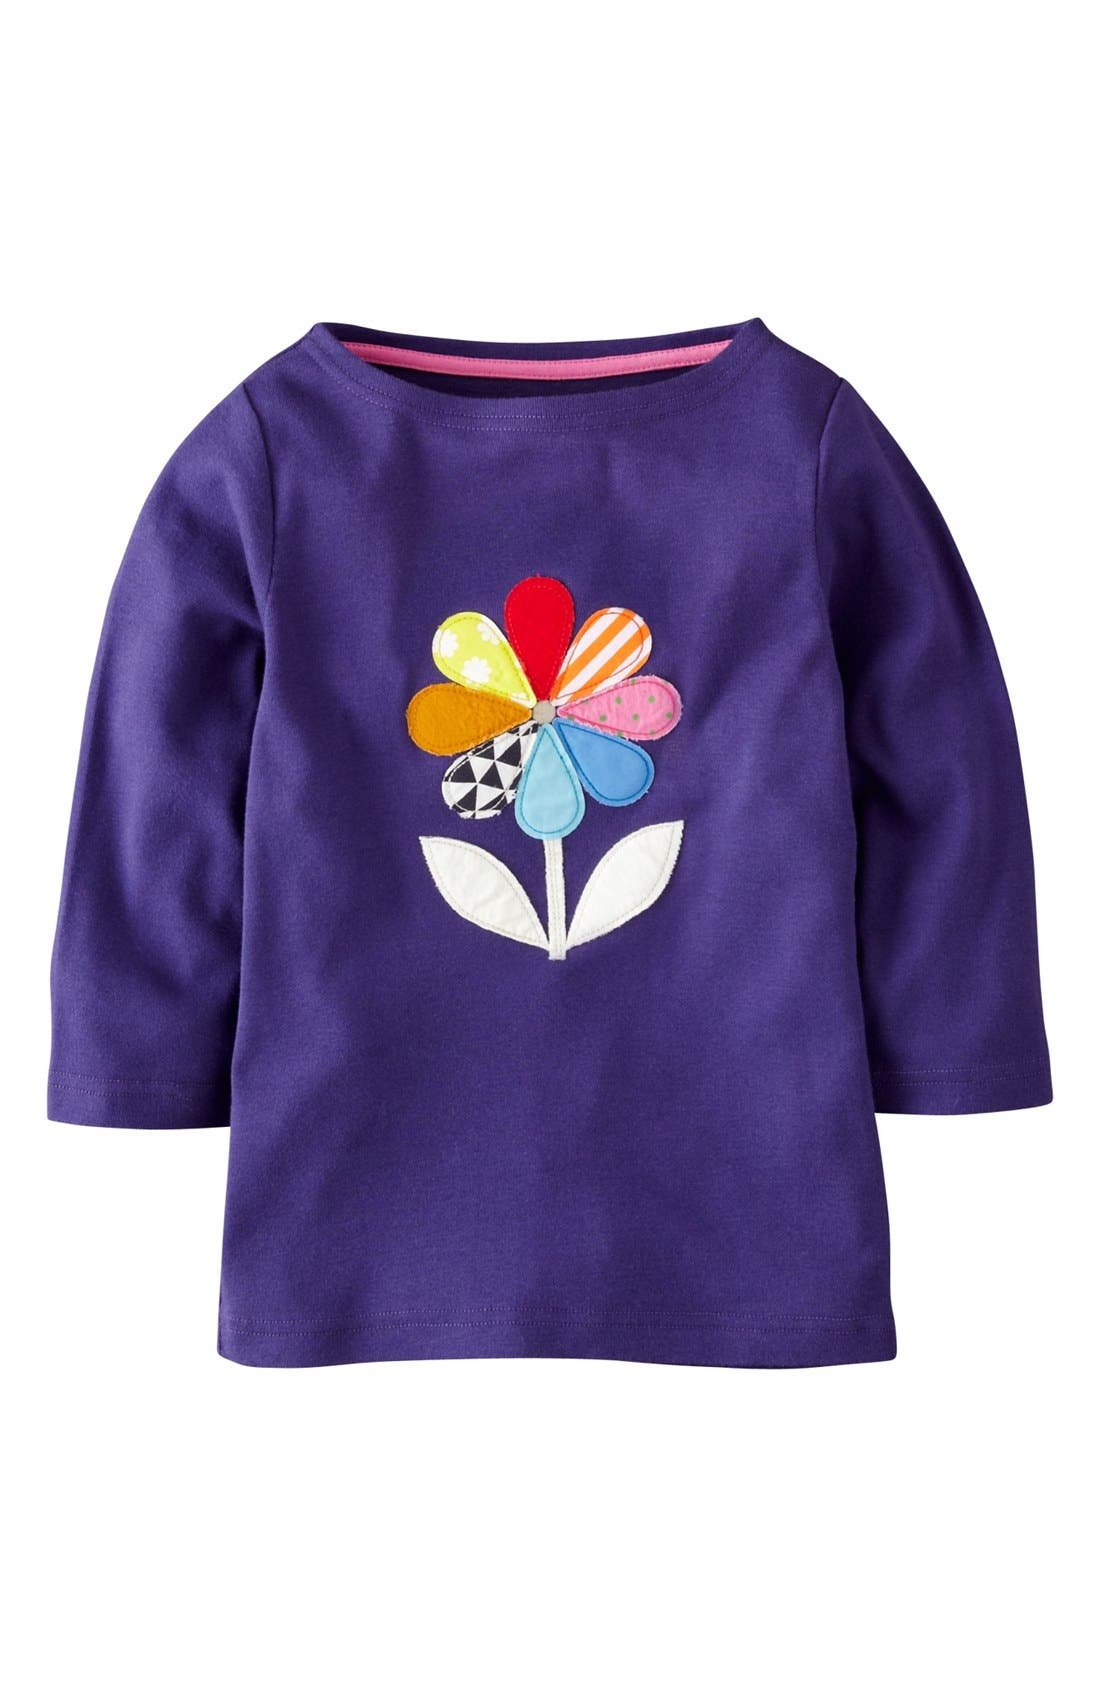 Main Image - Mini Boden 'Kaleidoscope Appliqué' Tee (Toddler Girls)